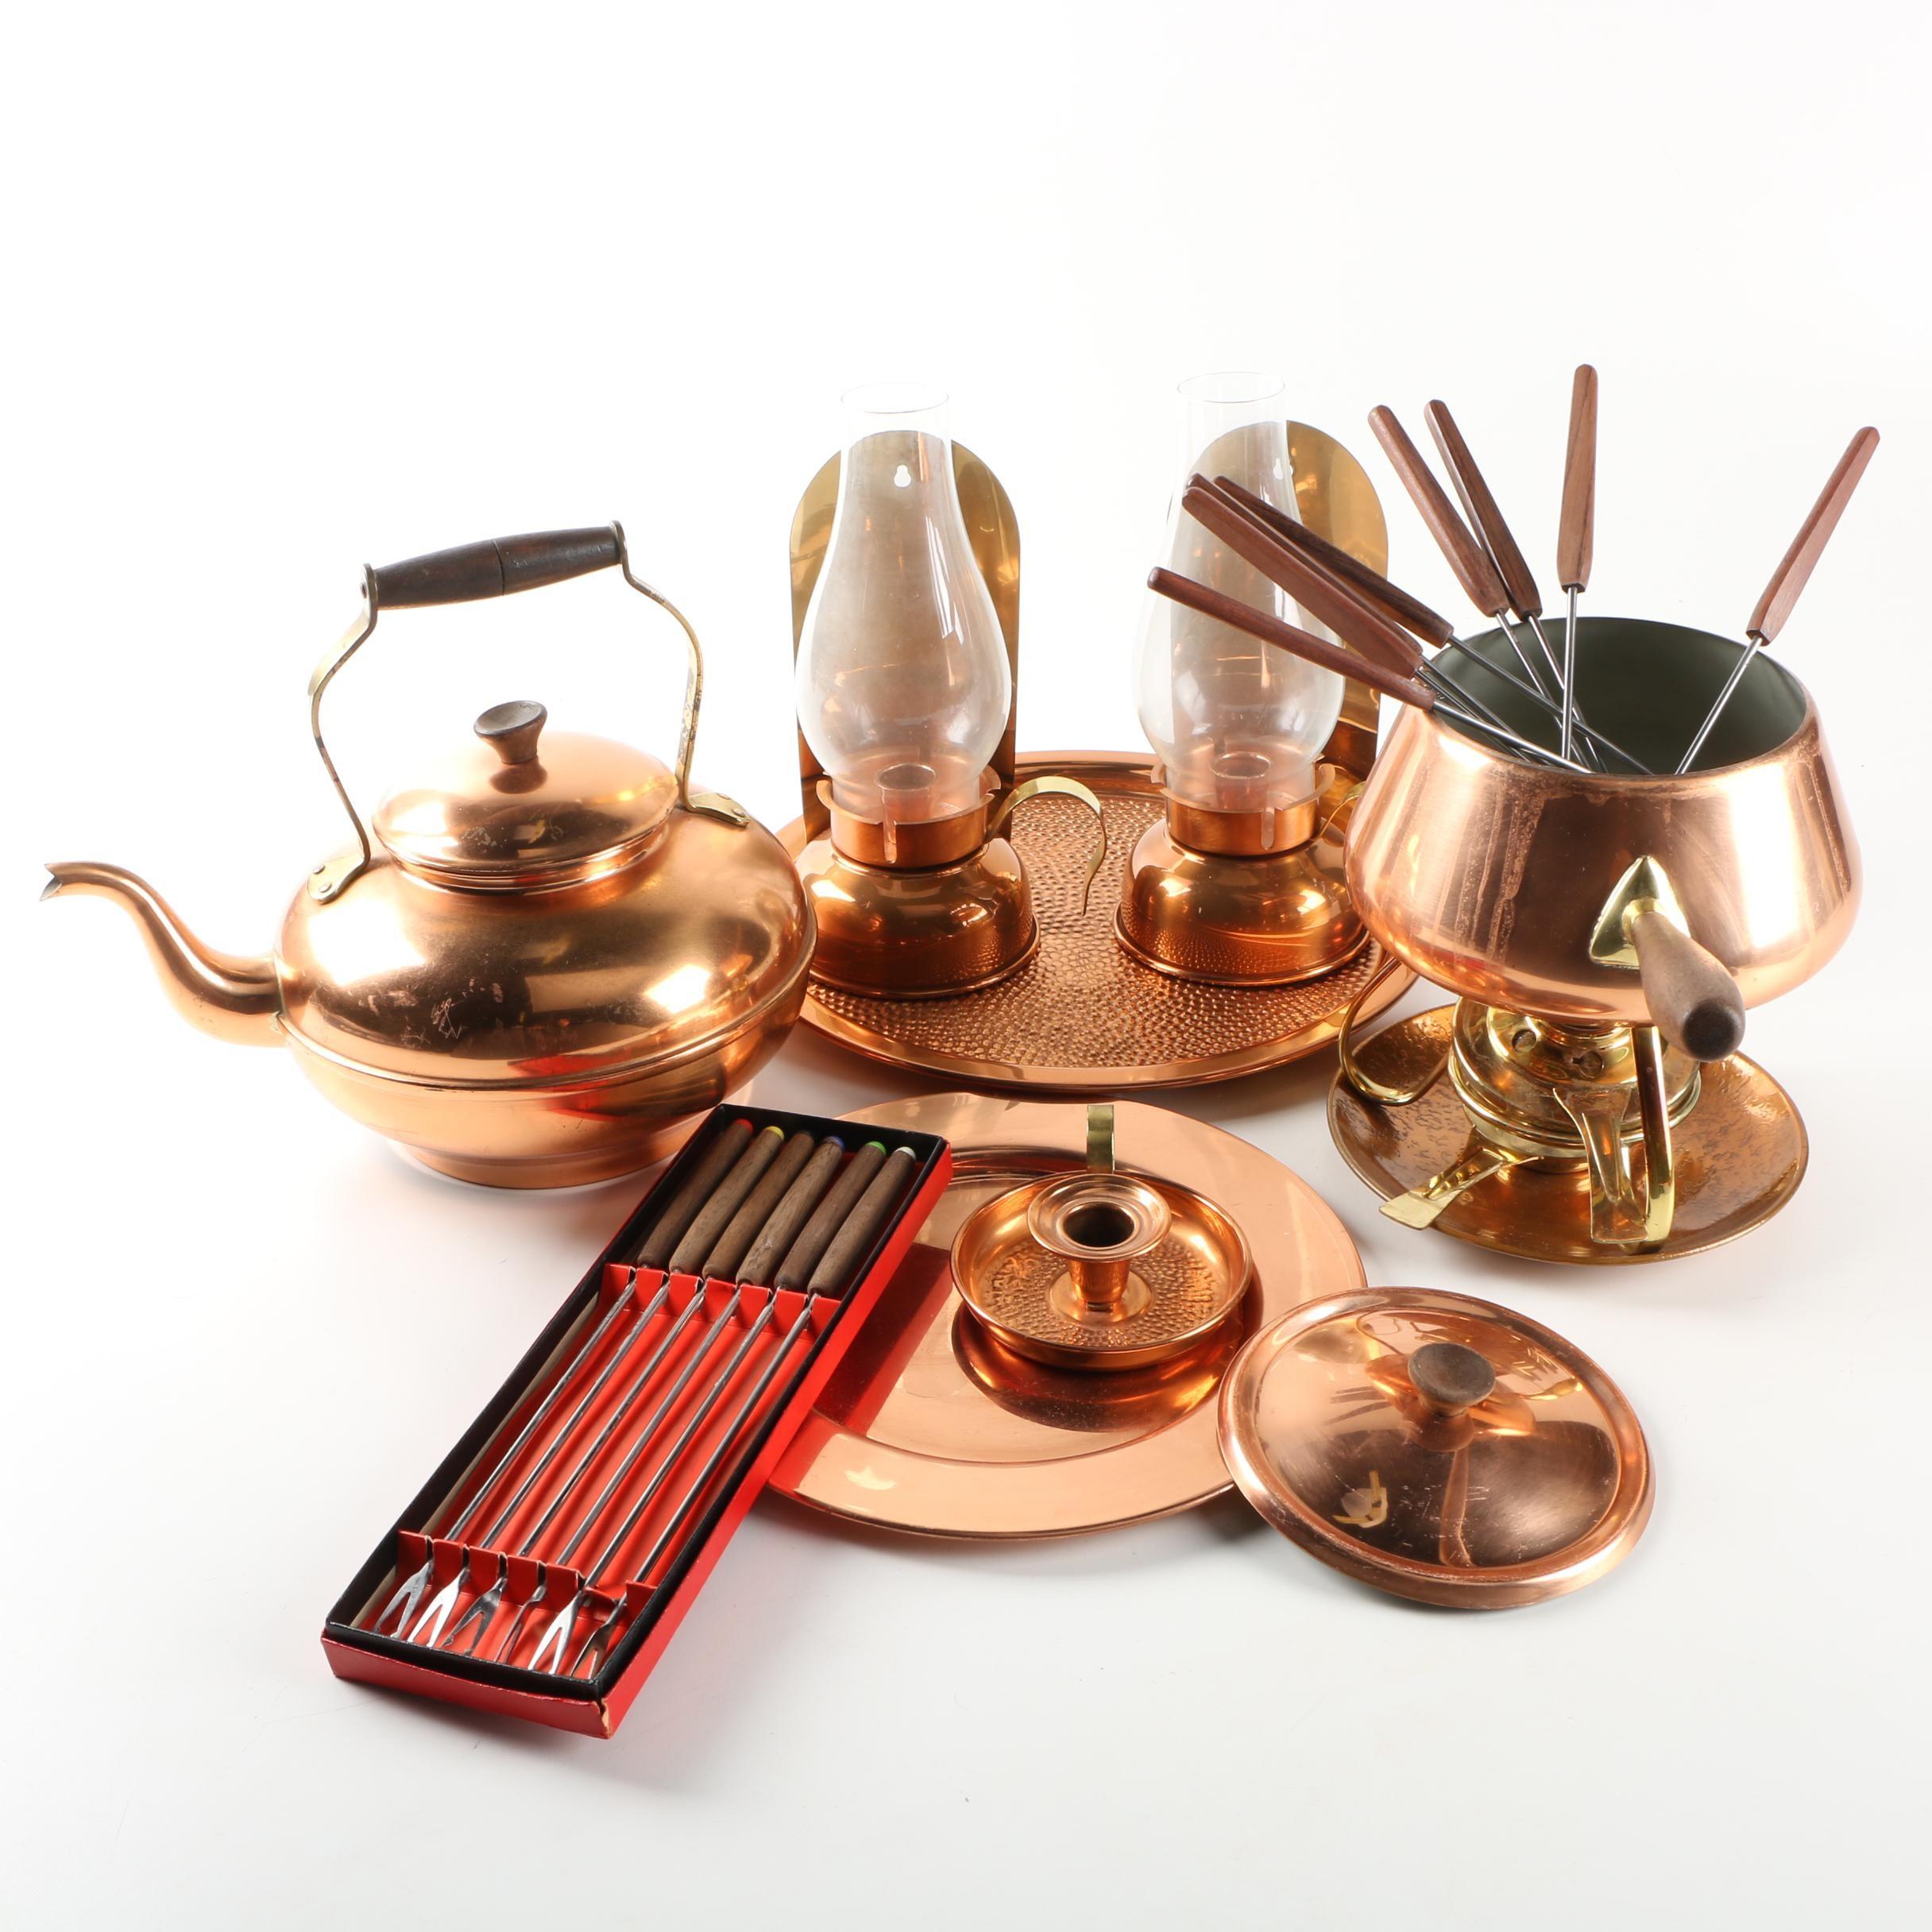 Copper Tableware Featuring Tagus ...  sc 1 st  EBTH.com & Copper Tableware Featuring Tagus : EBTH